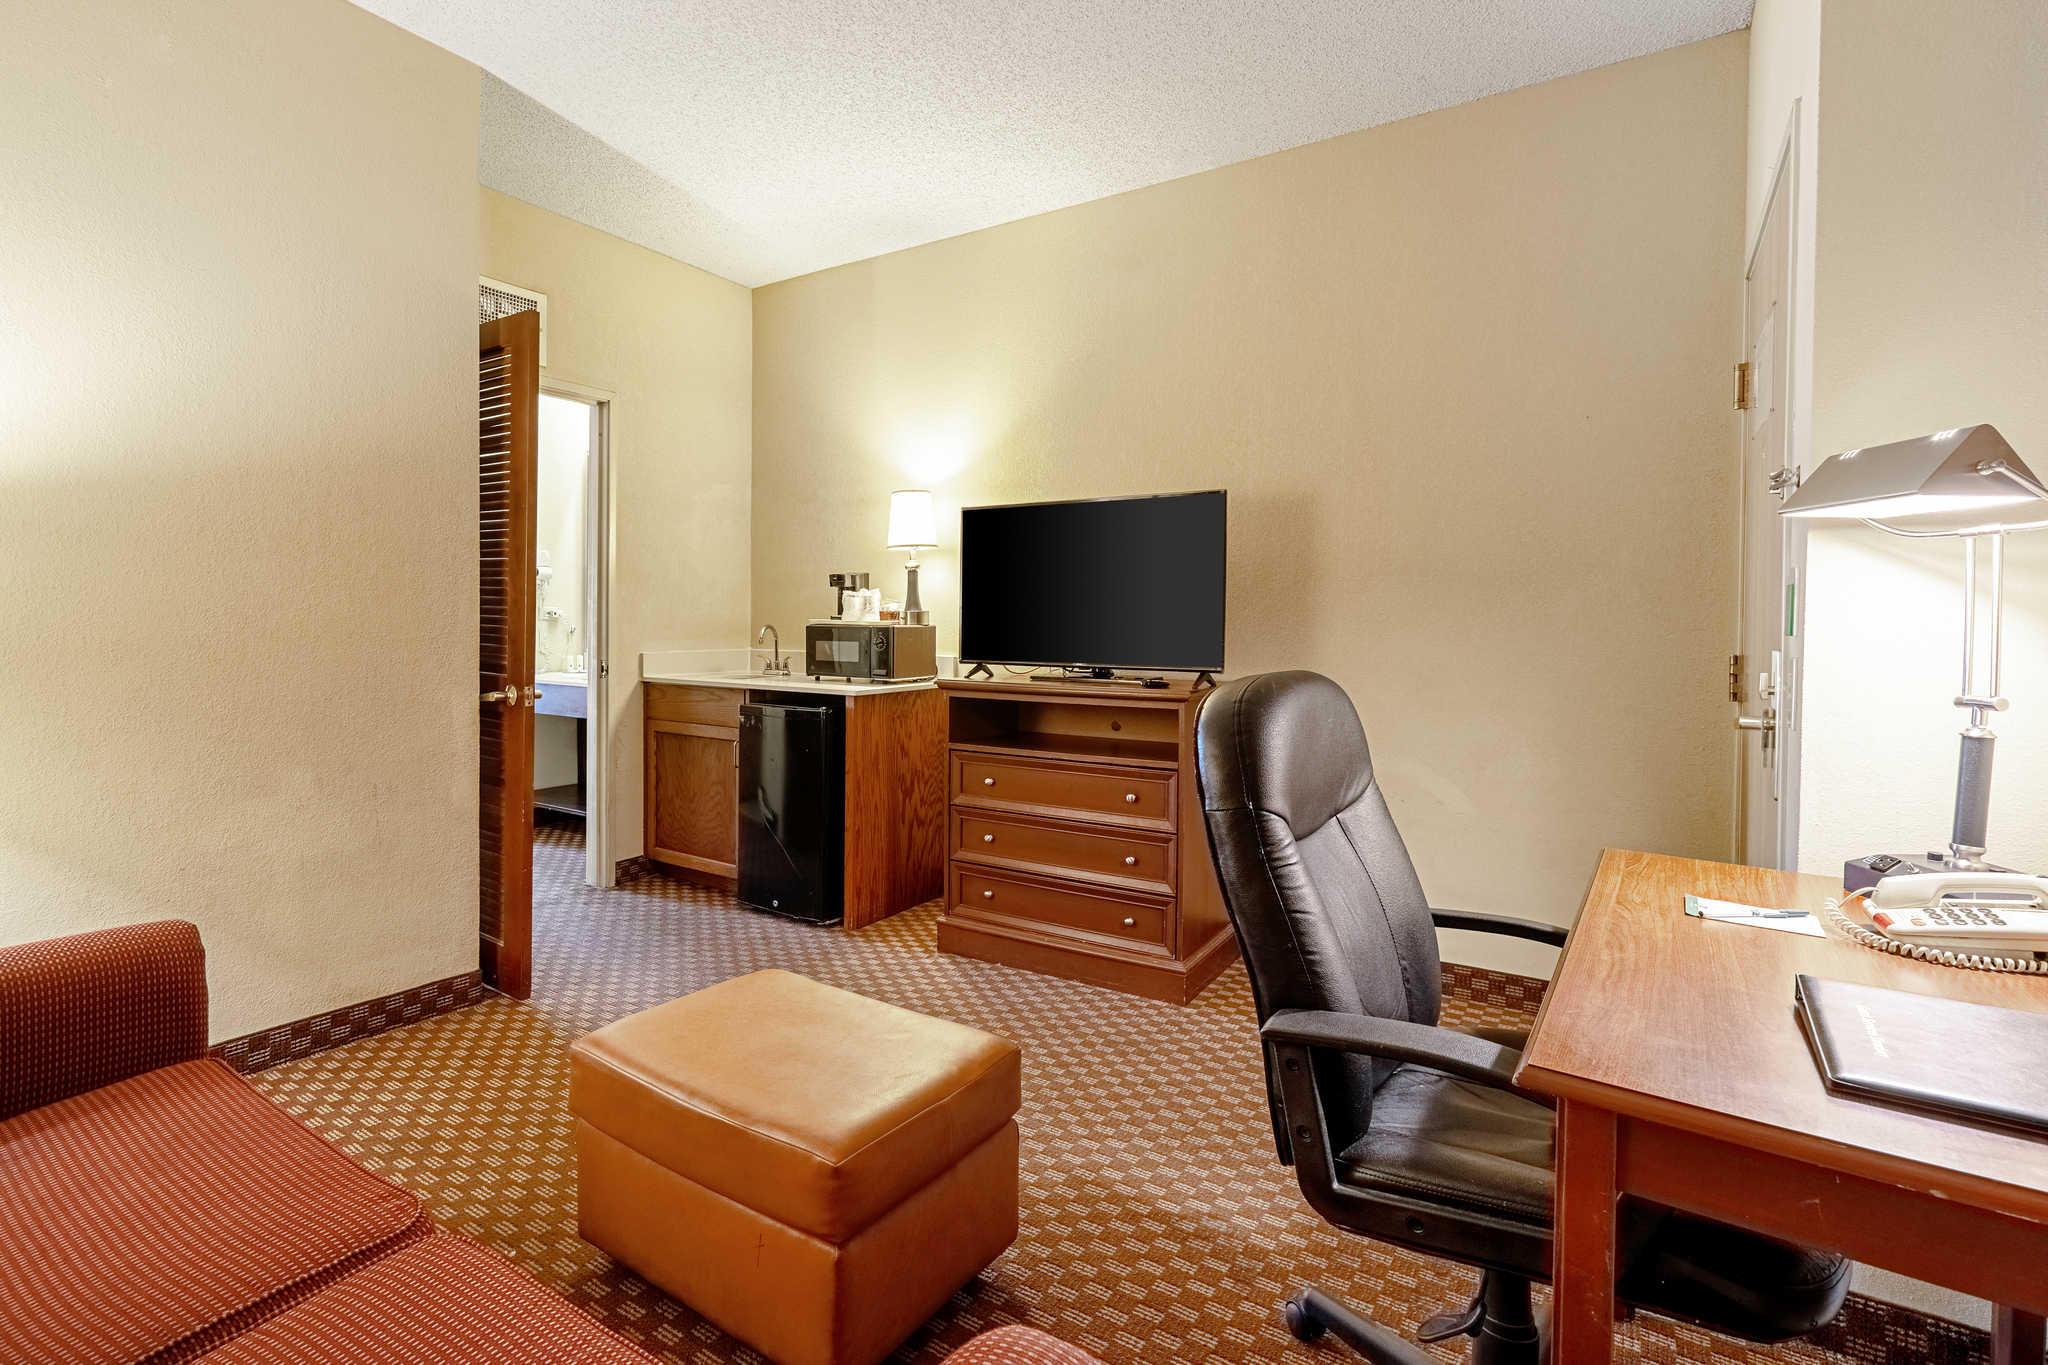 Quality Suites image 25